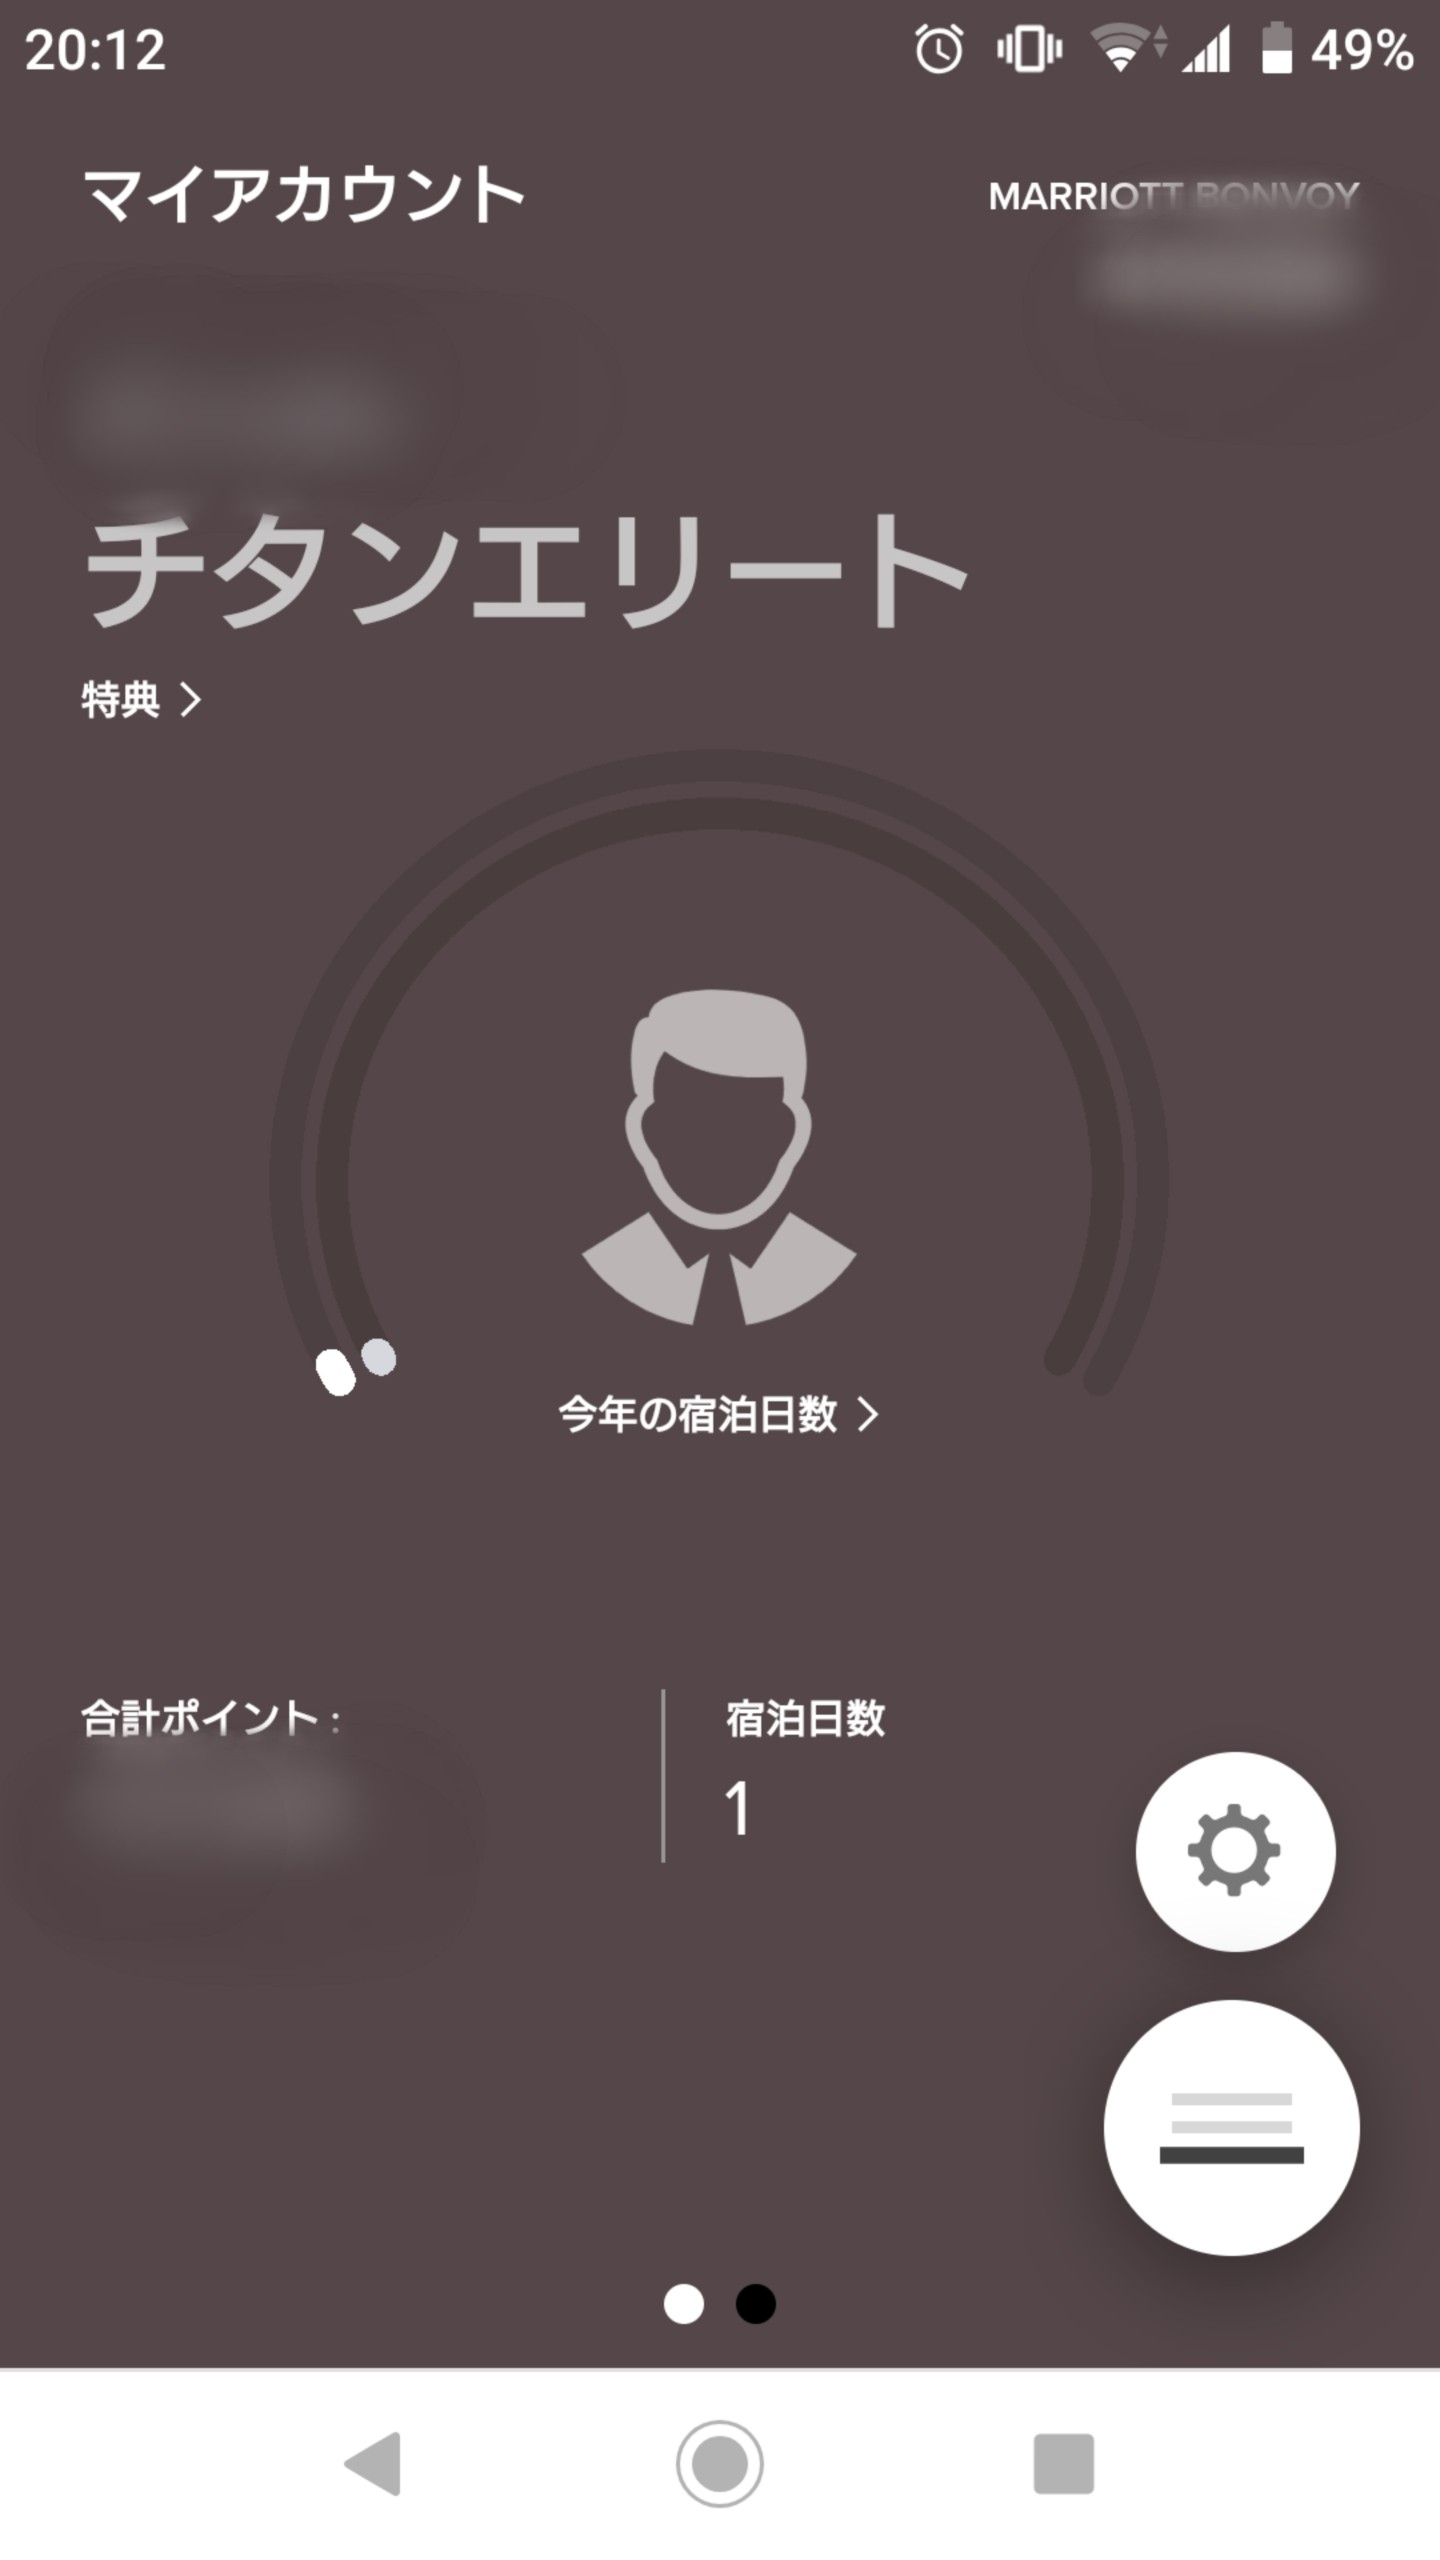 f:id:shikachannel:20190305202031j:image